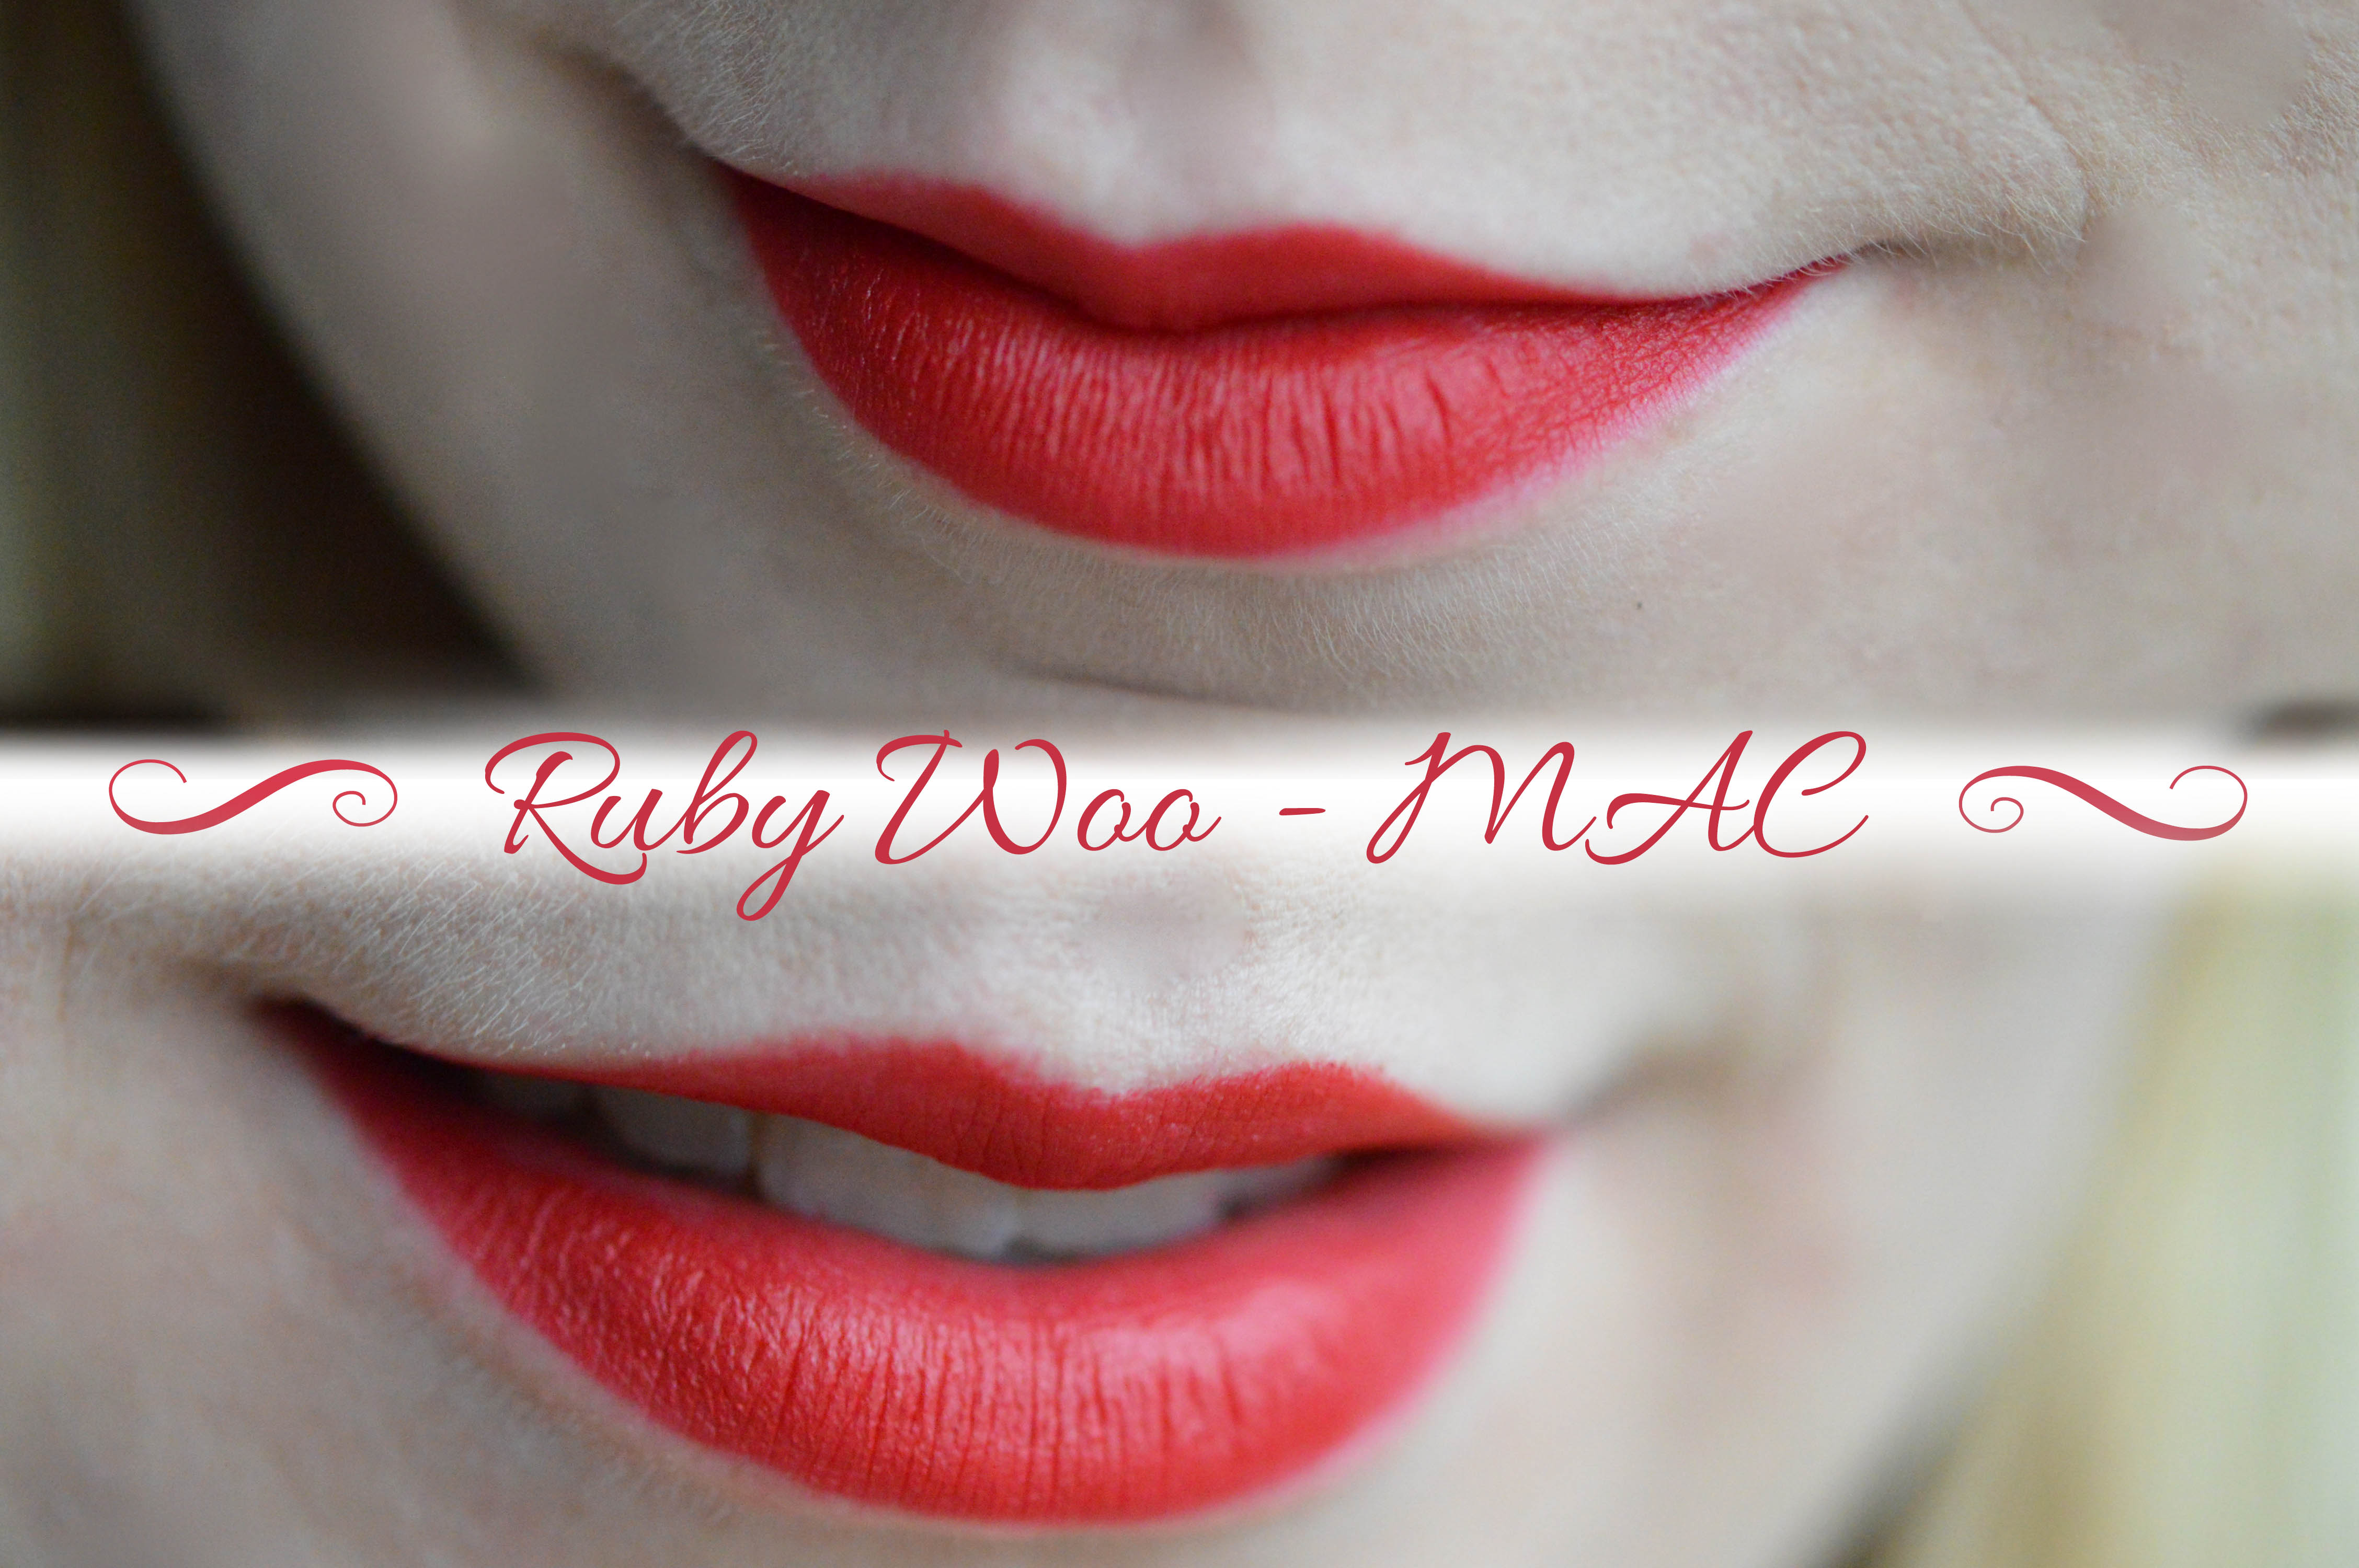 ALITTLEB_BLOG_BEAUTE_MAC_LEVRES_MAT_RUBY_WOO